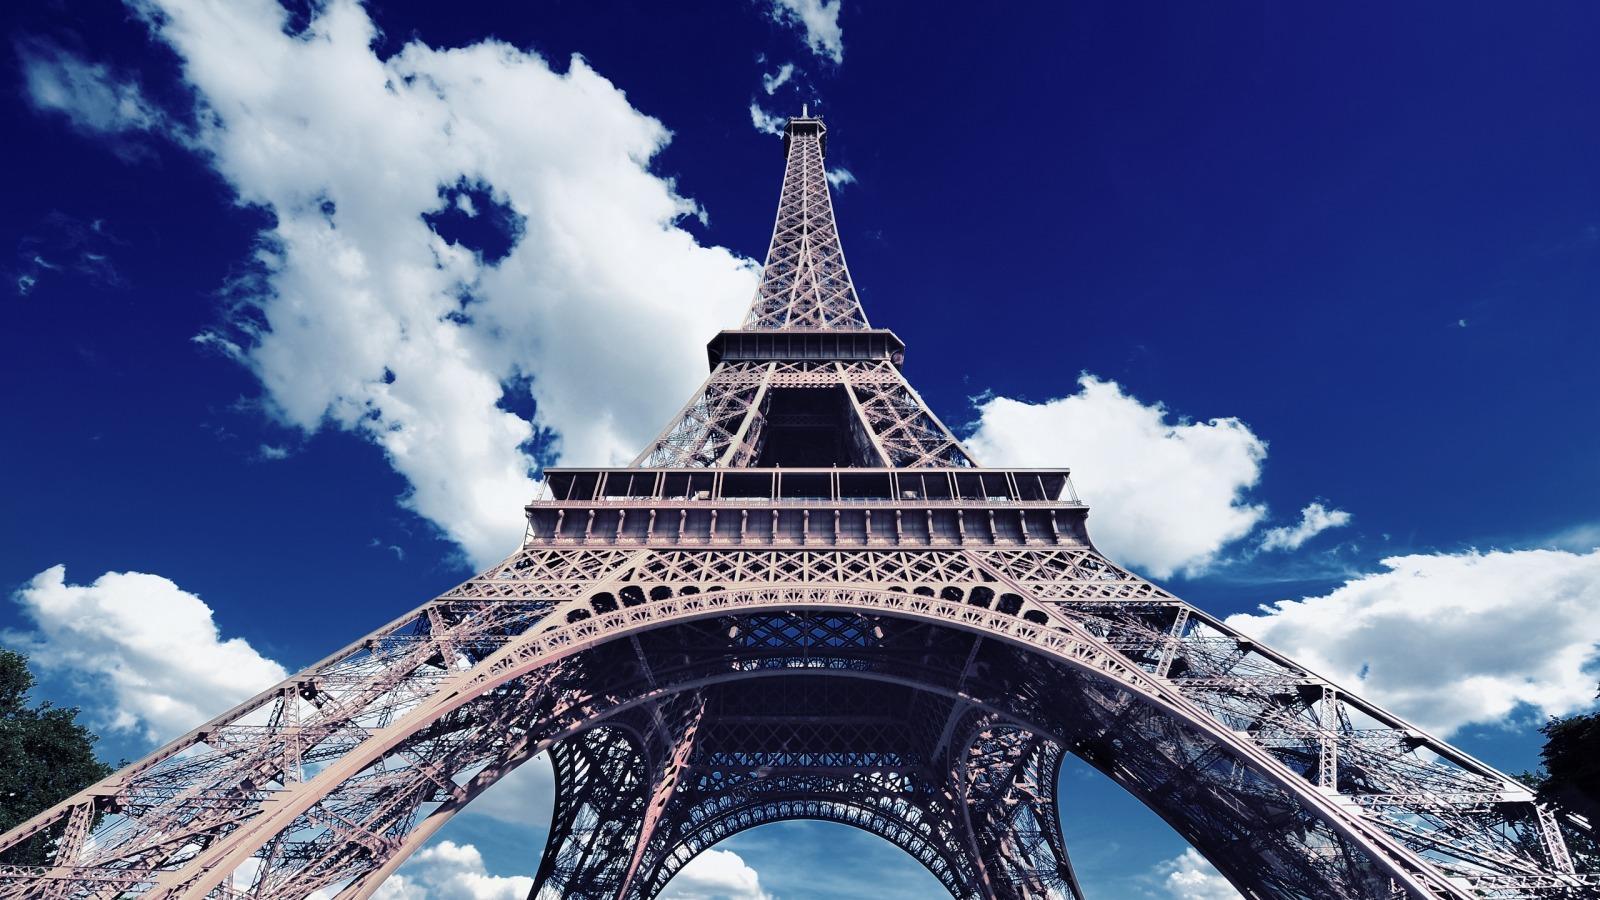 بالصور صور لبرج ايفل , اجمل صور لبرح ايفل بفرنسا 3314 22